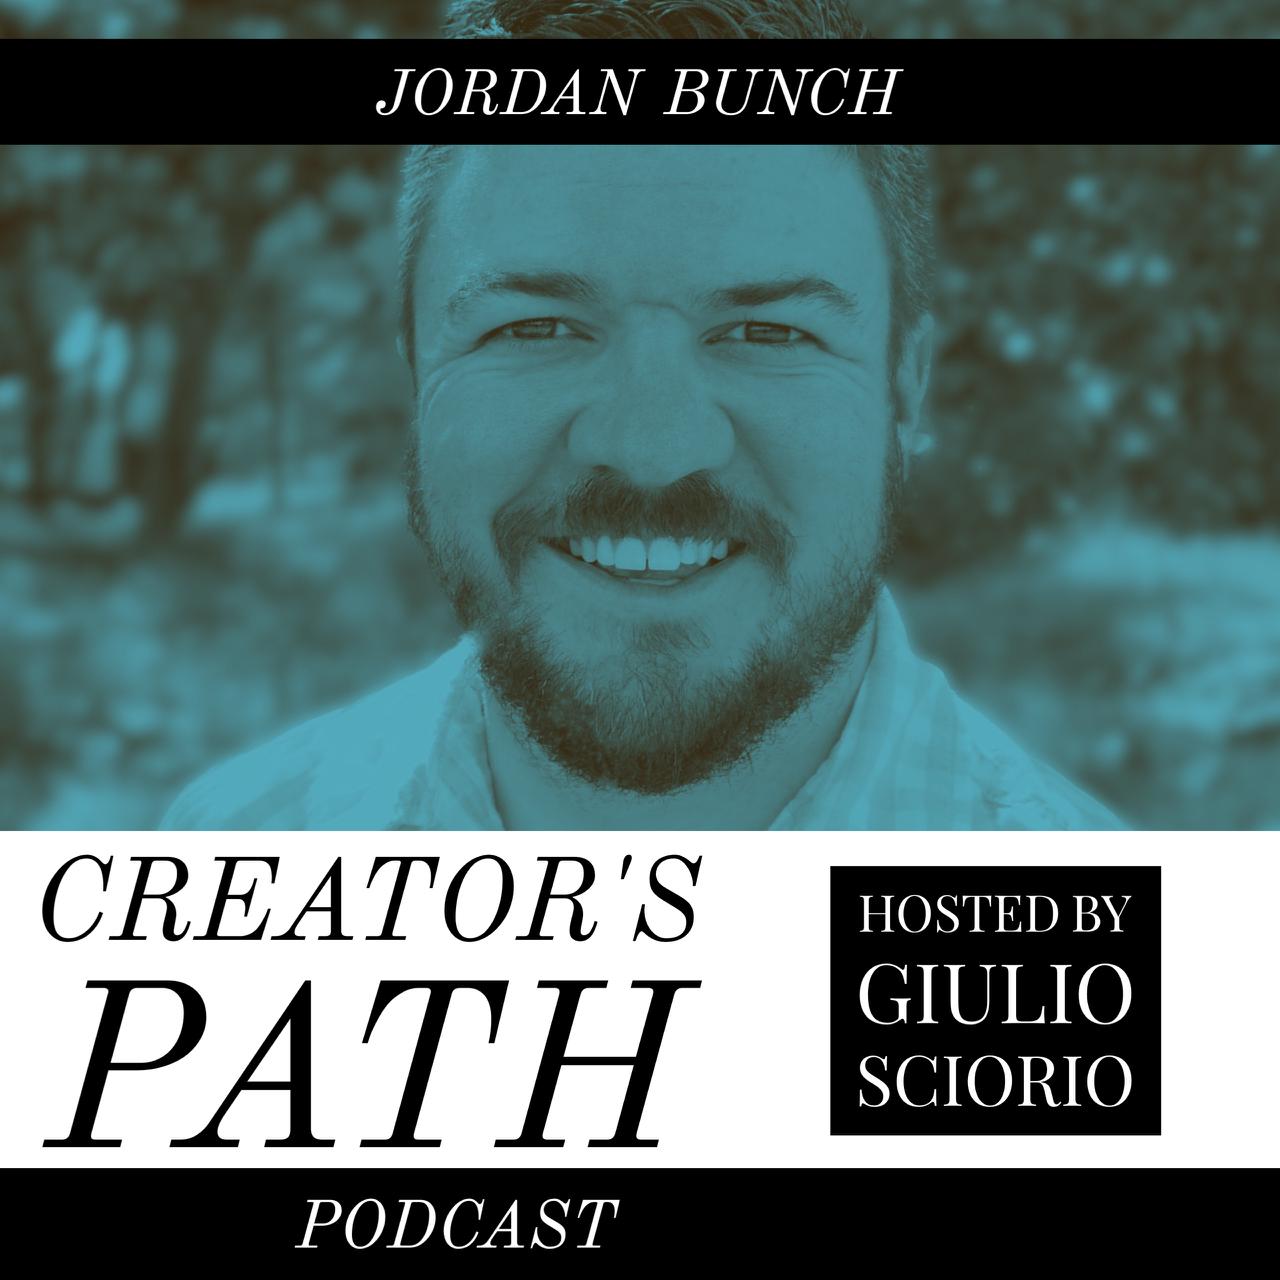 A podcast with an Austin Texas Wedding Videographer, Jordan Bunch